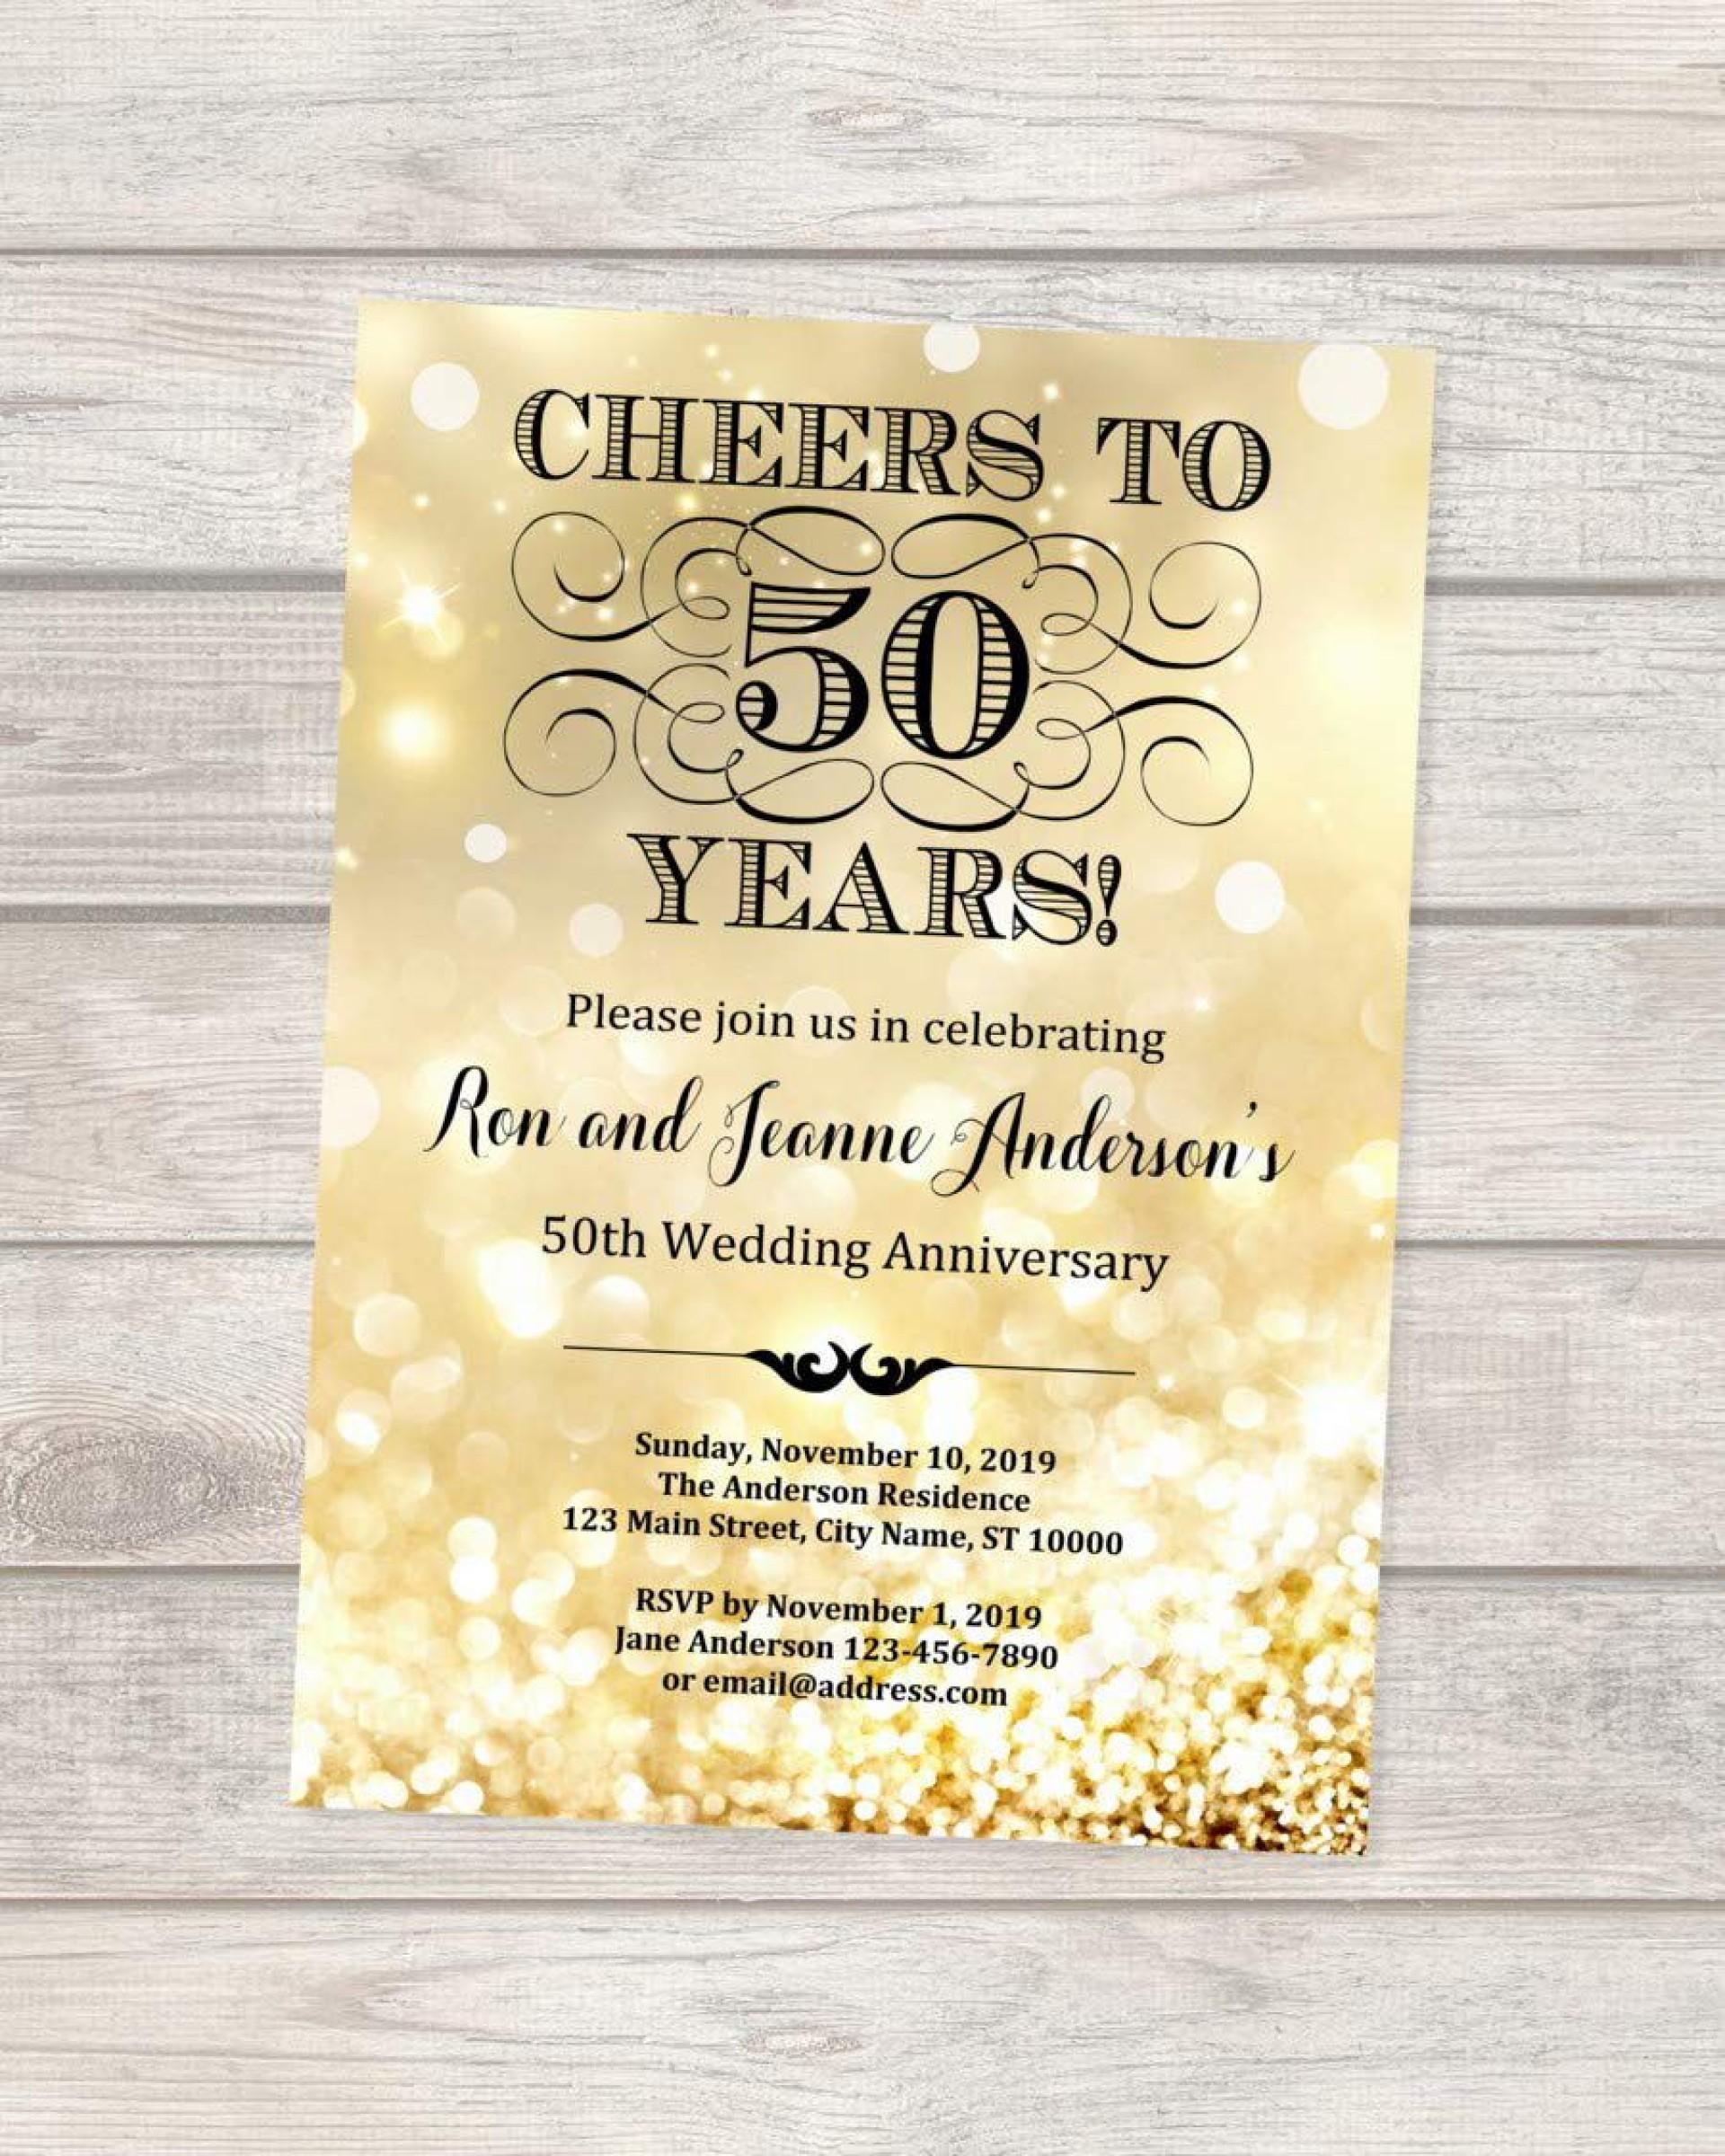 004 Shocking 50th Anniversary Invitation Design Concept  Designs Wedding Template Microsoft Word Surprise Party Wording Card Idea1920